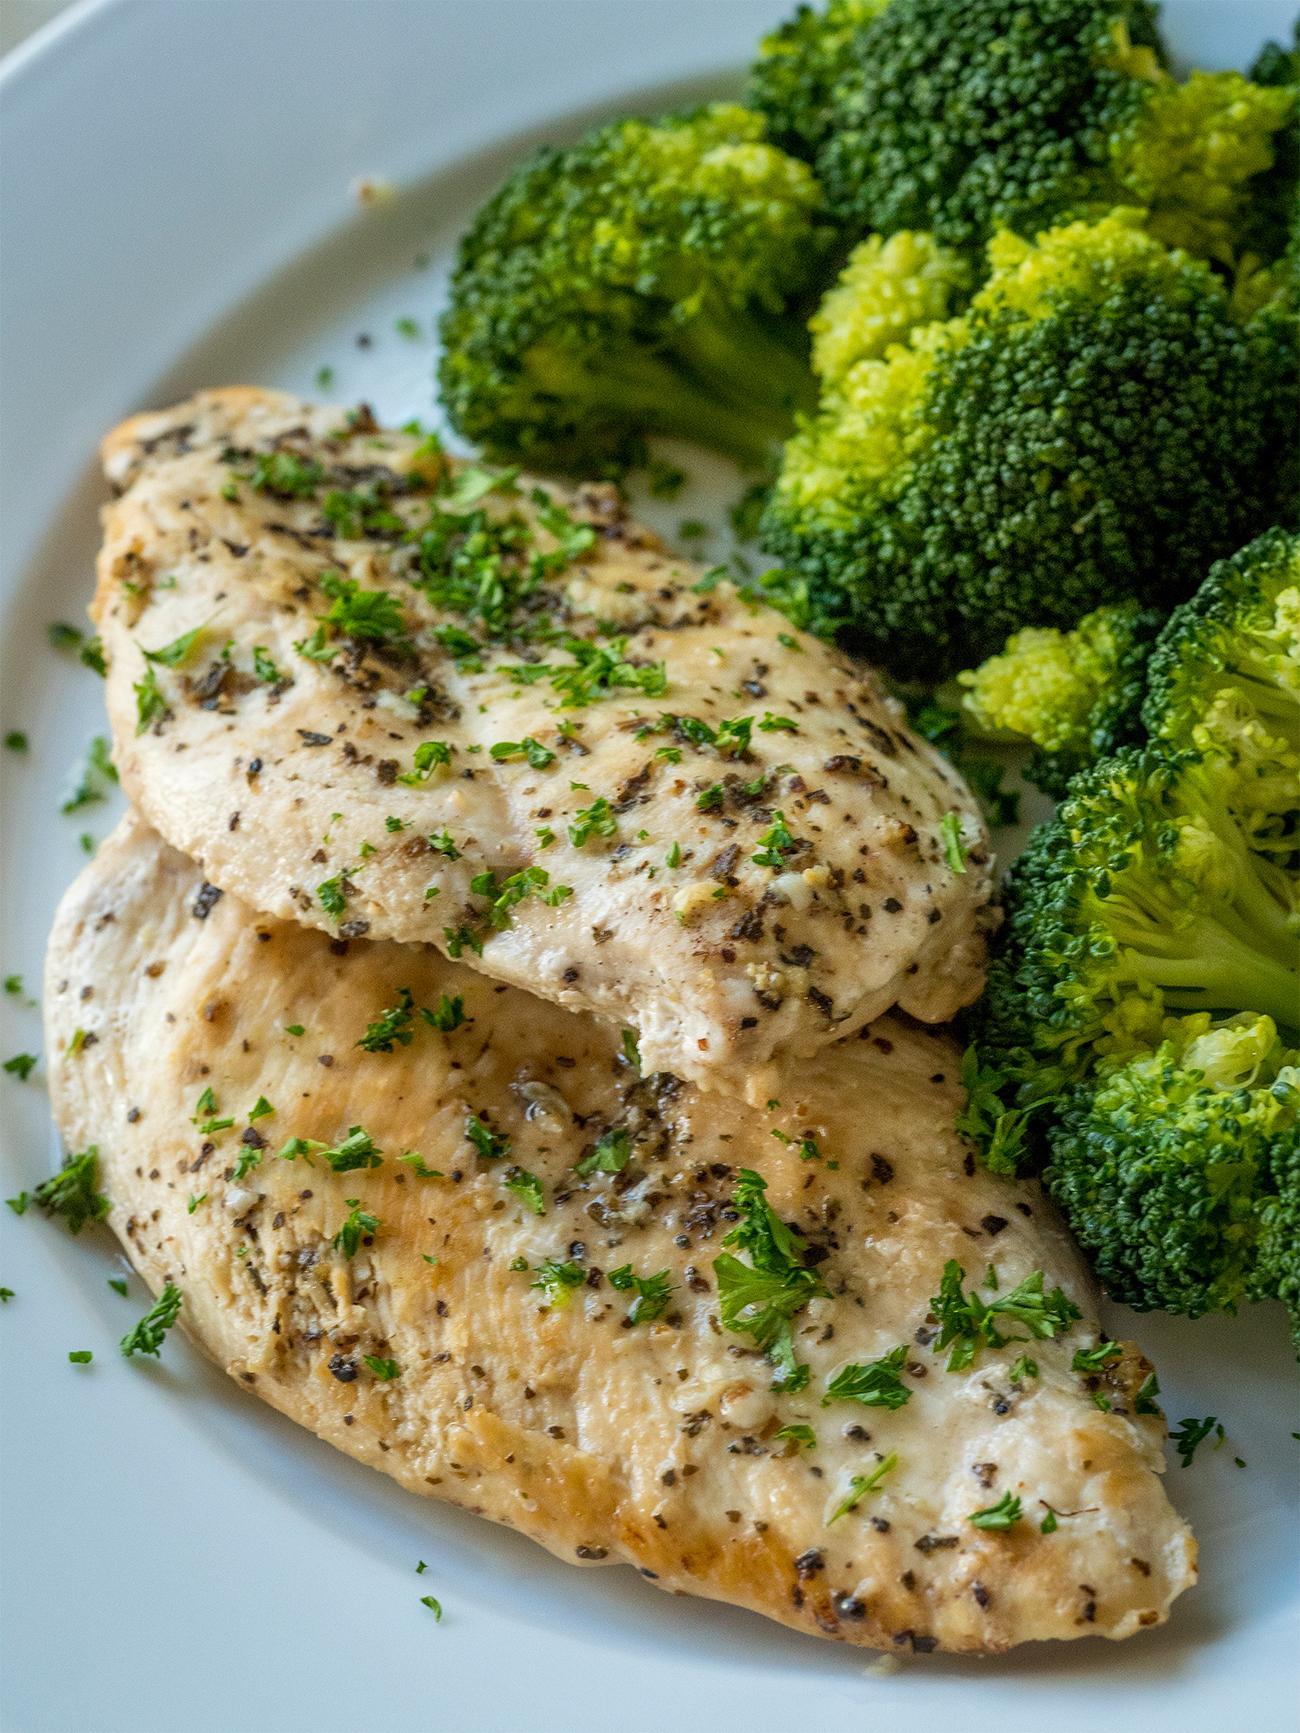 Slow-Cooker-Healthy-Lemon-Garlic-Chicken-Vertical-1